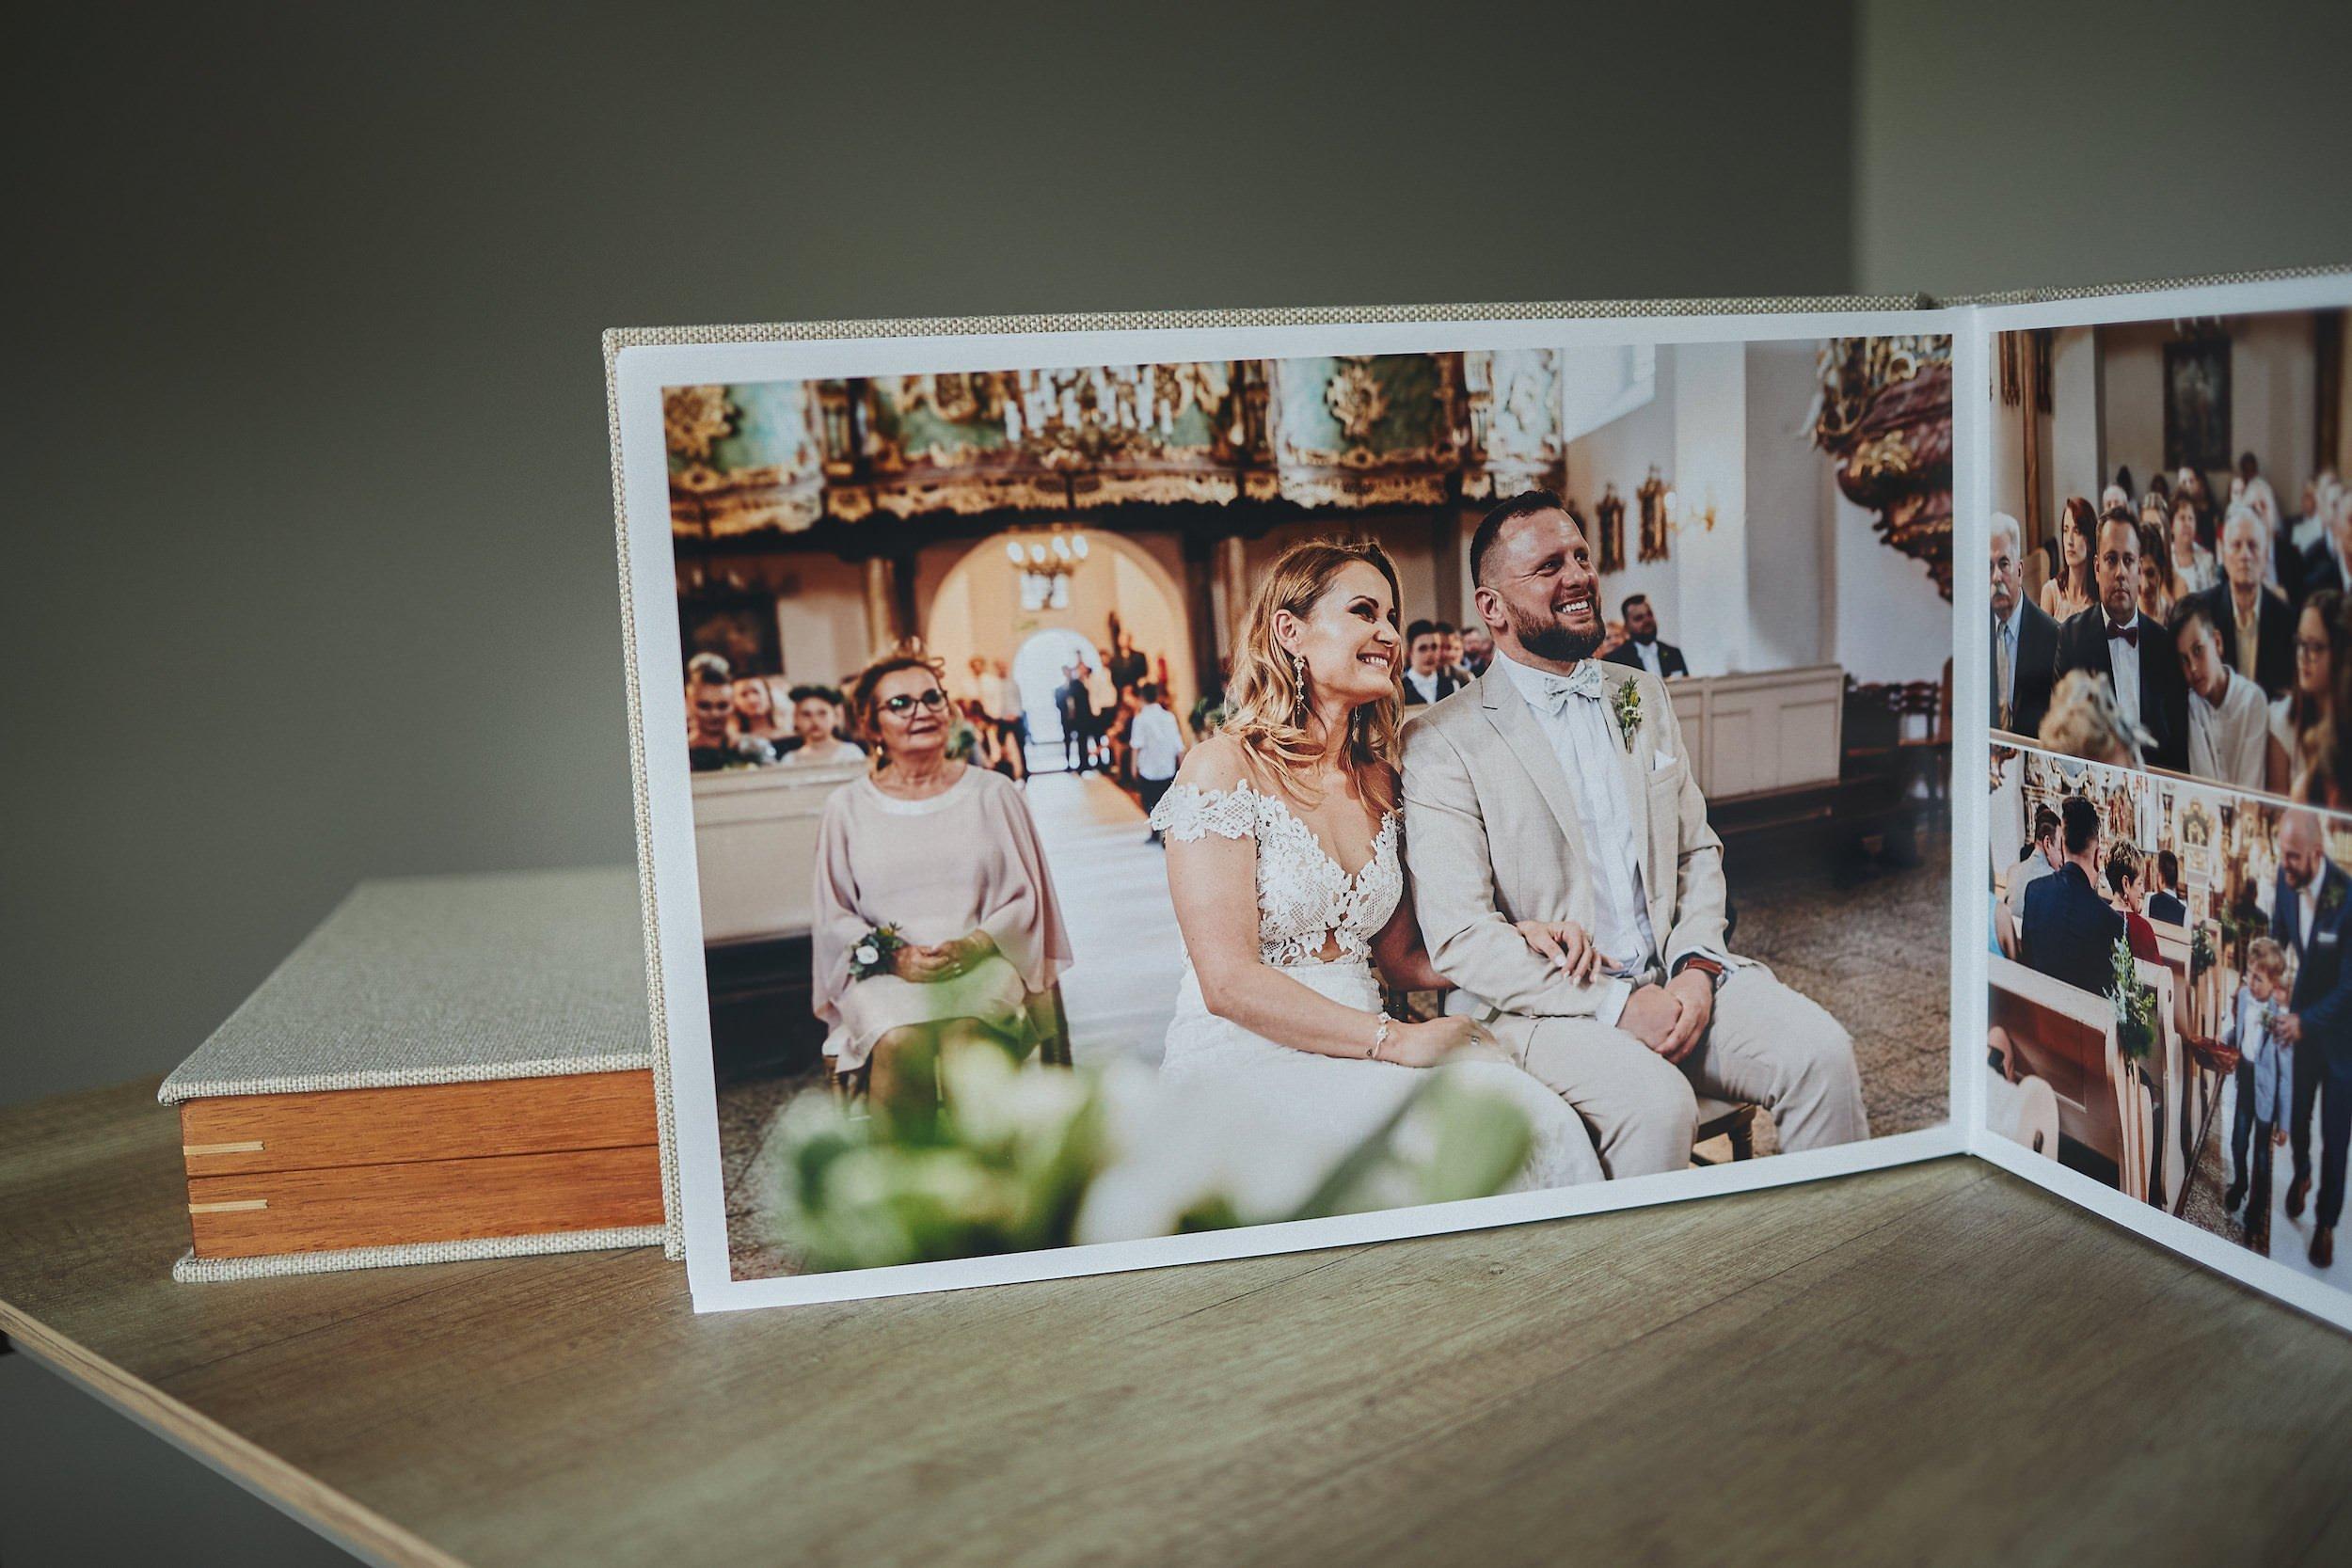 wedding-albums-ireland-00024 66